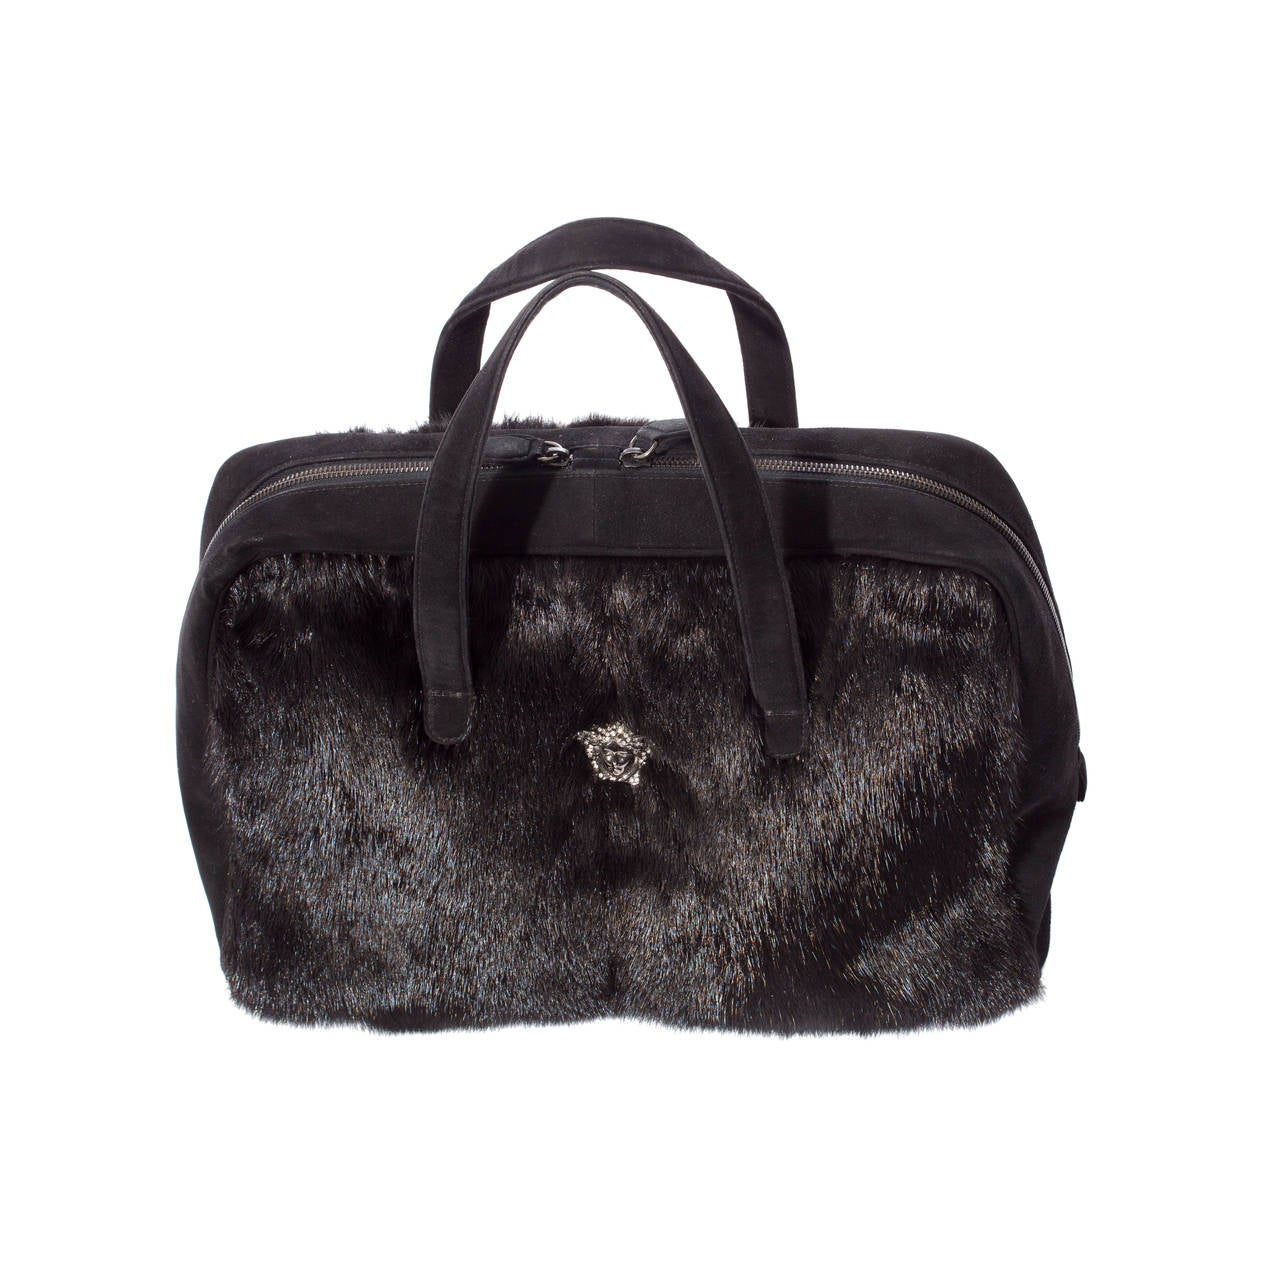 Versace Couture Mink Handbag at 1stdibs